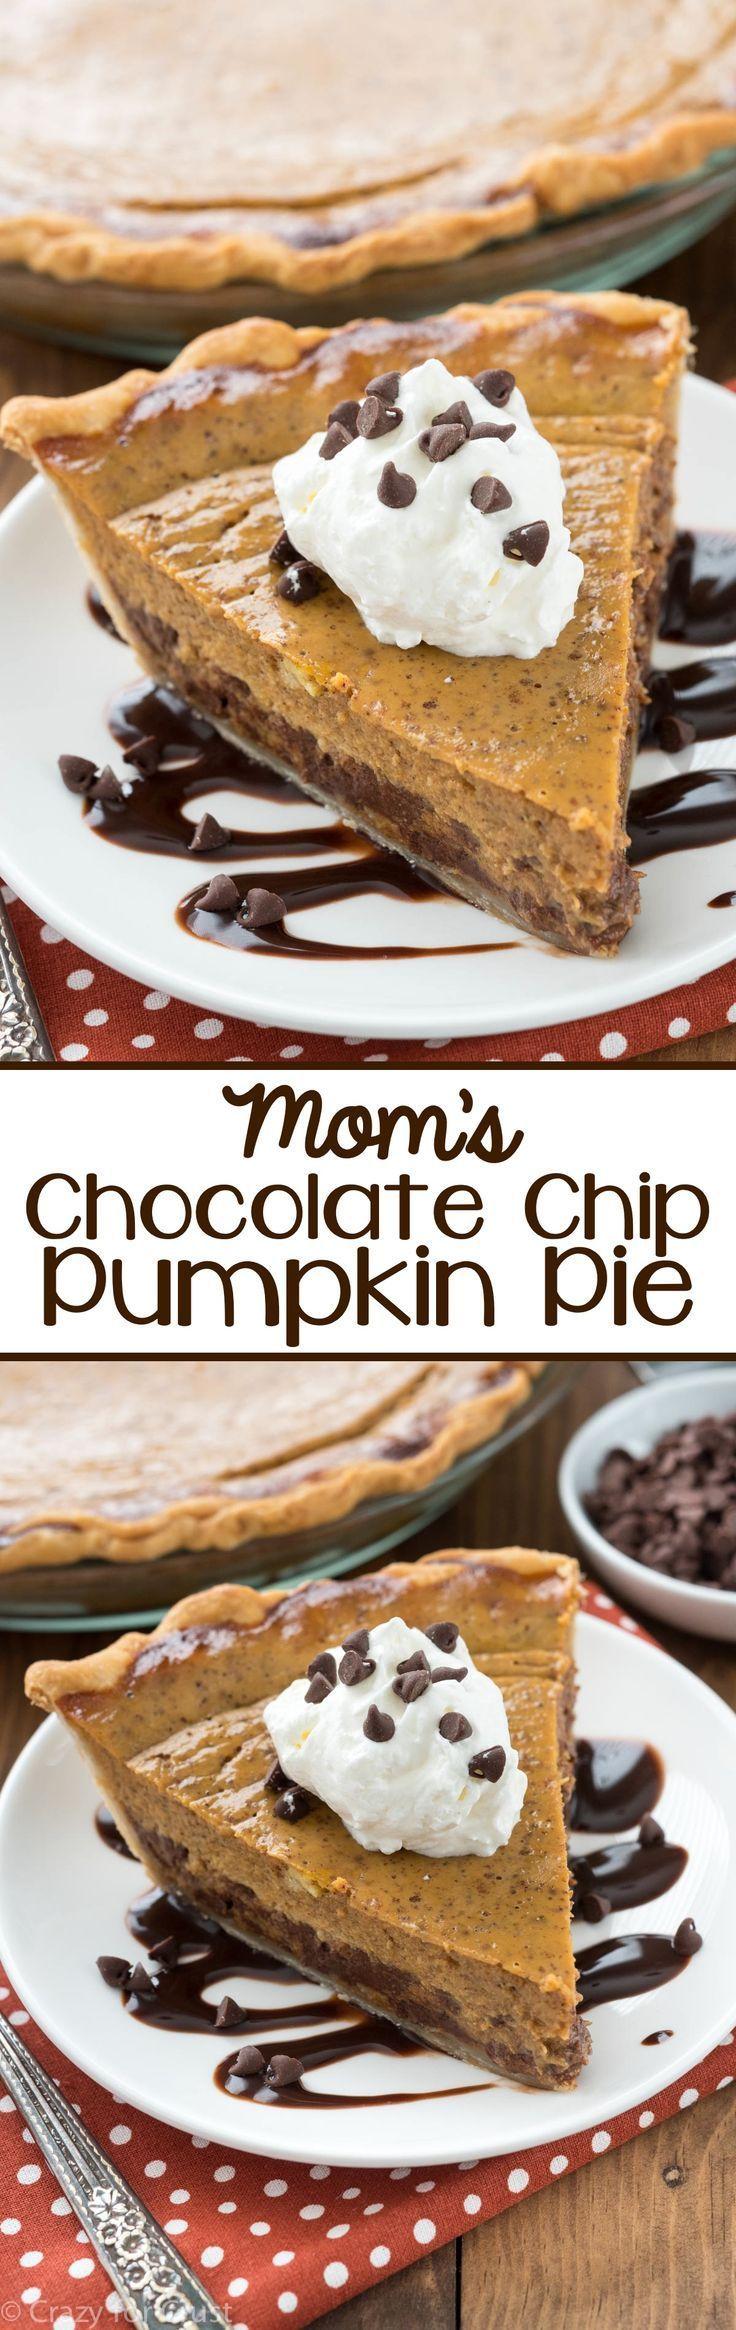 Mom's Chocolate Chip Pumpkin Pie - this easy pumpkin pie recipe is a family favorite! A traditional pumpkin pie that's filled with chocolate chips!